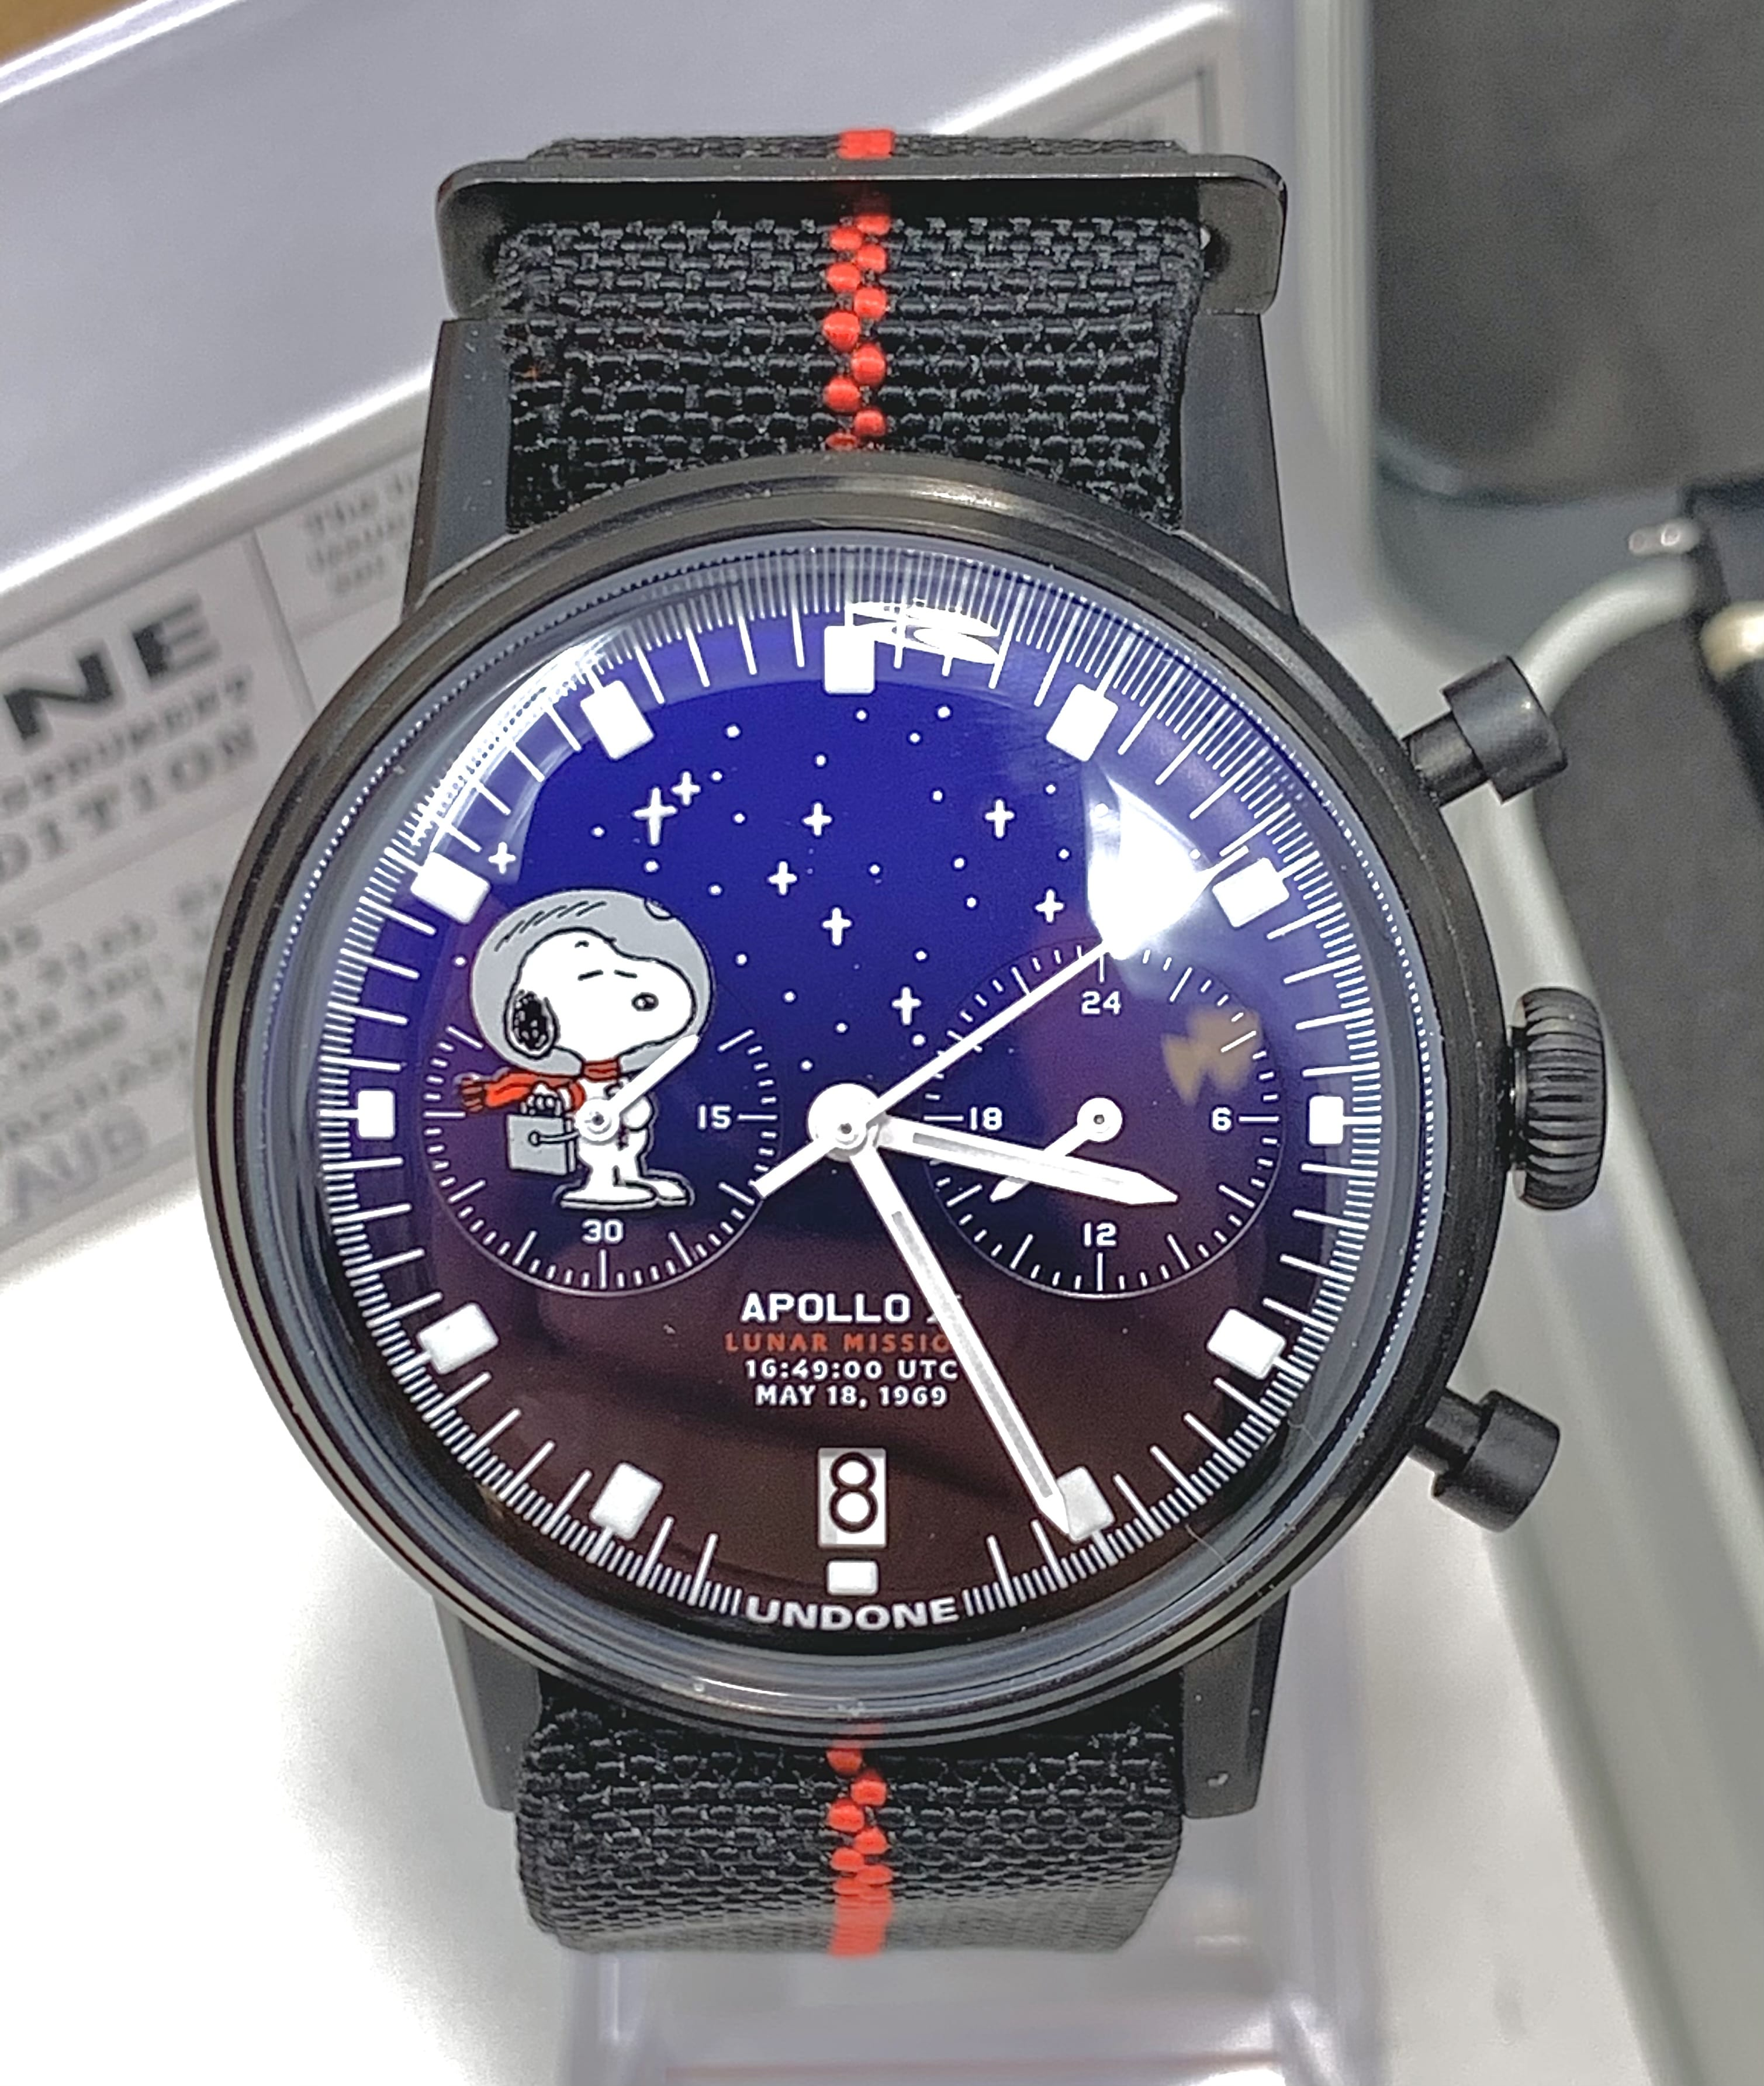 "Undone ""limited edition"" Snoopy Starlight NASA Apollo X Mission Chronograph"